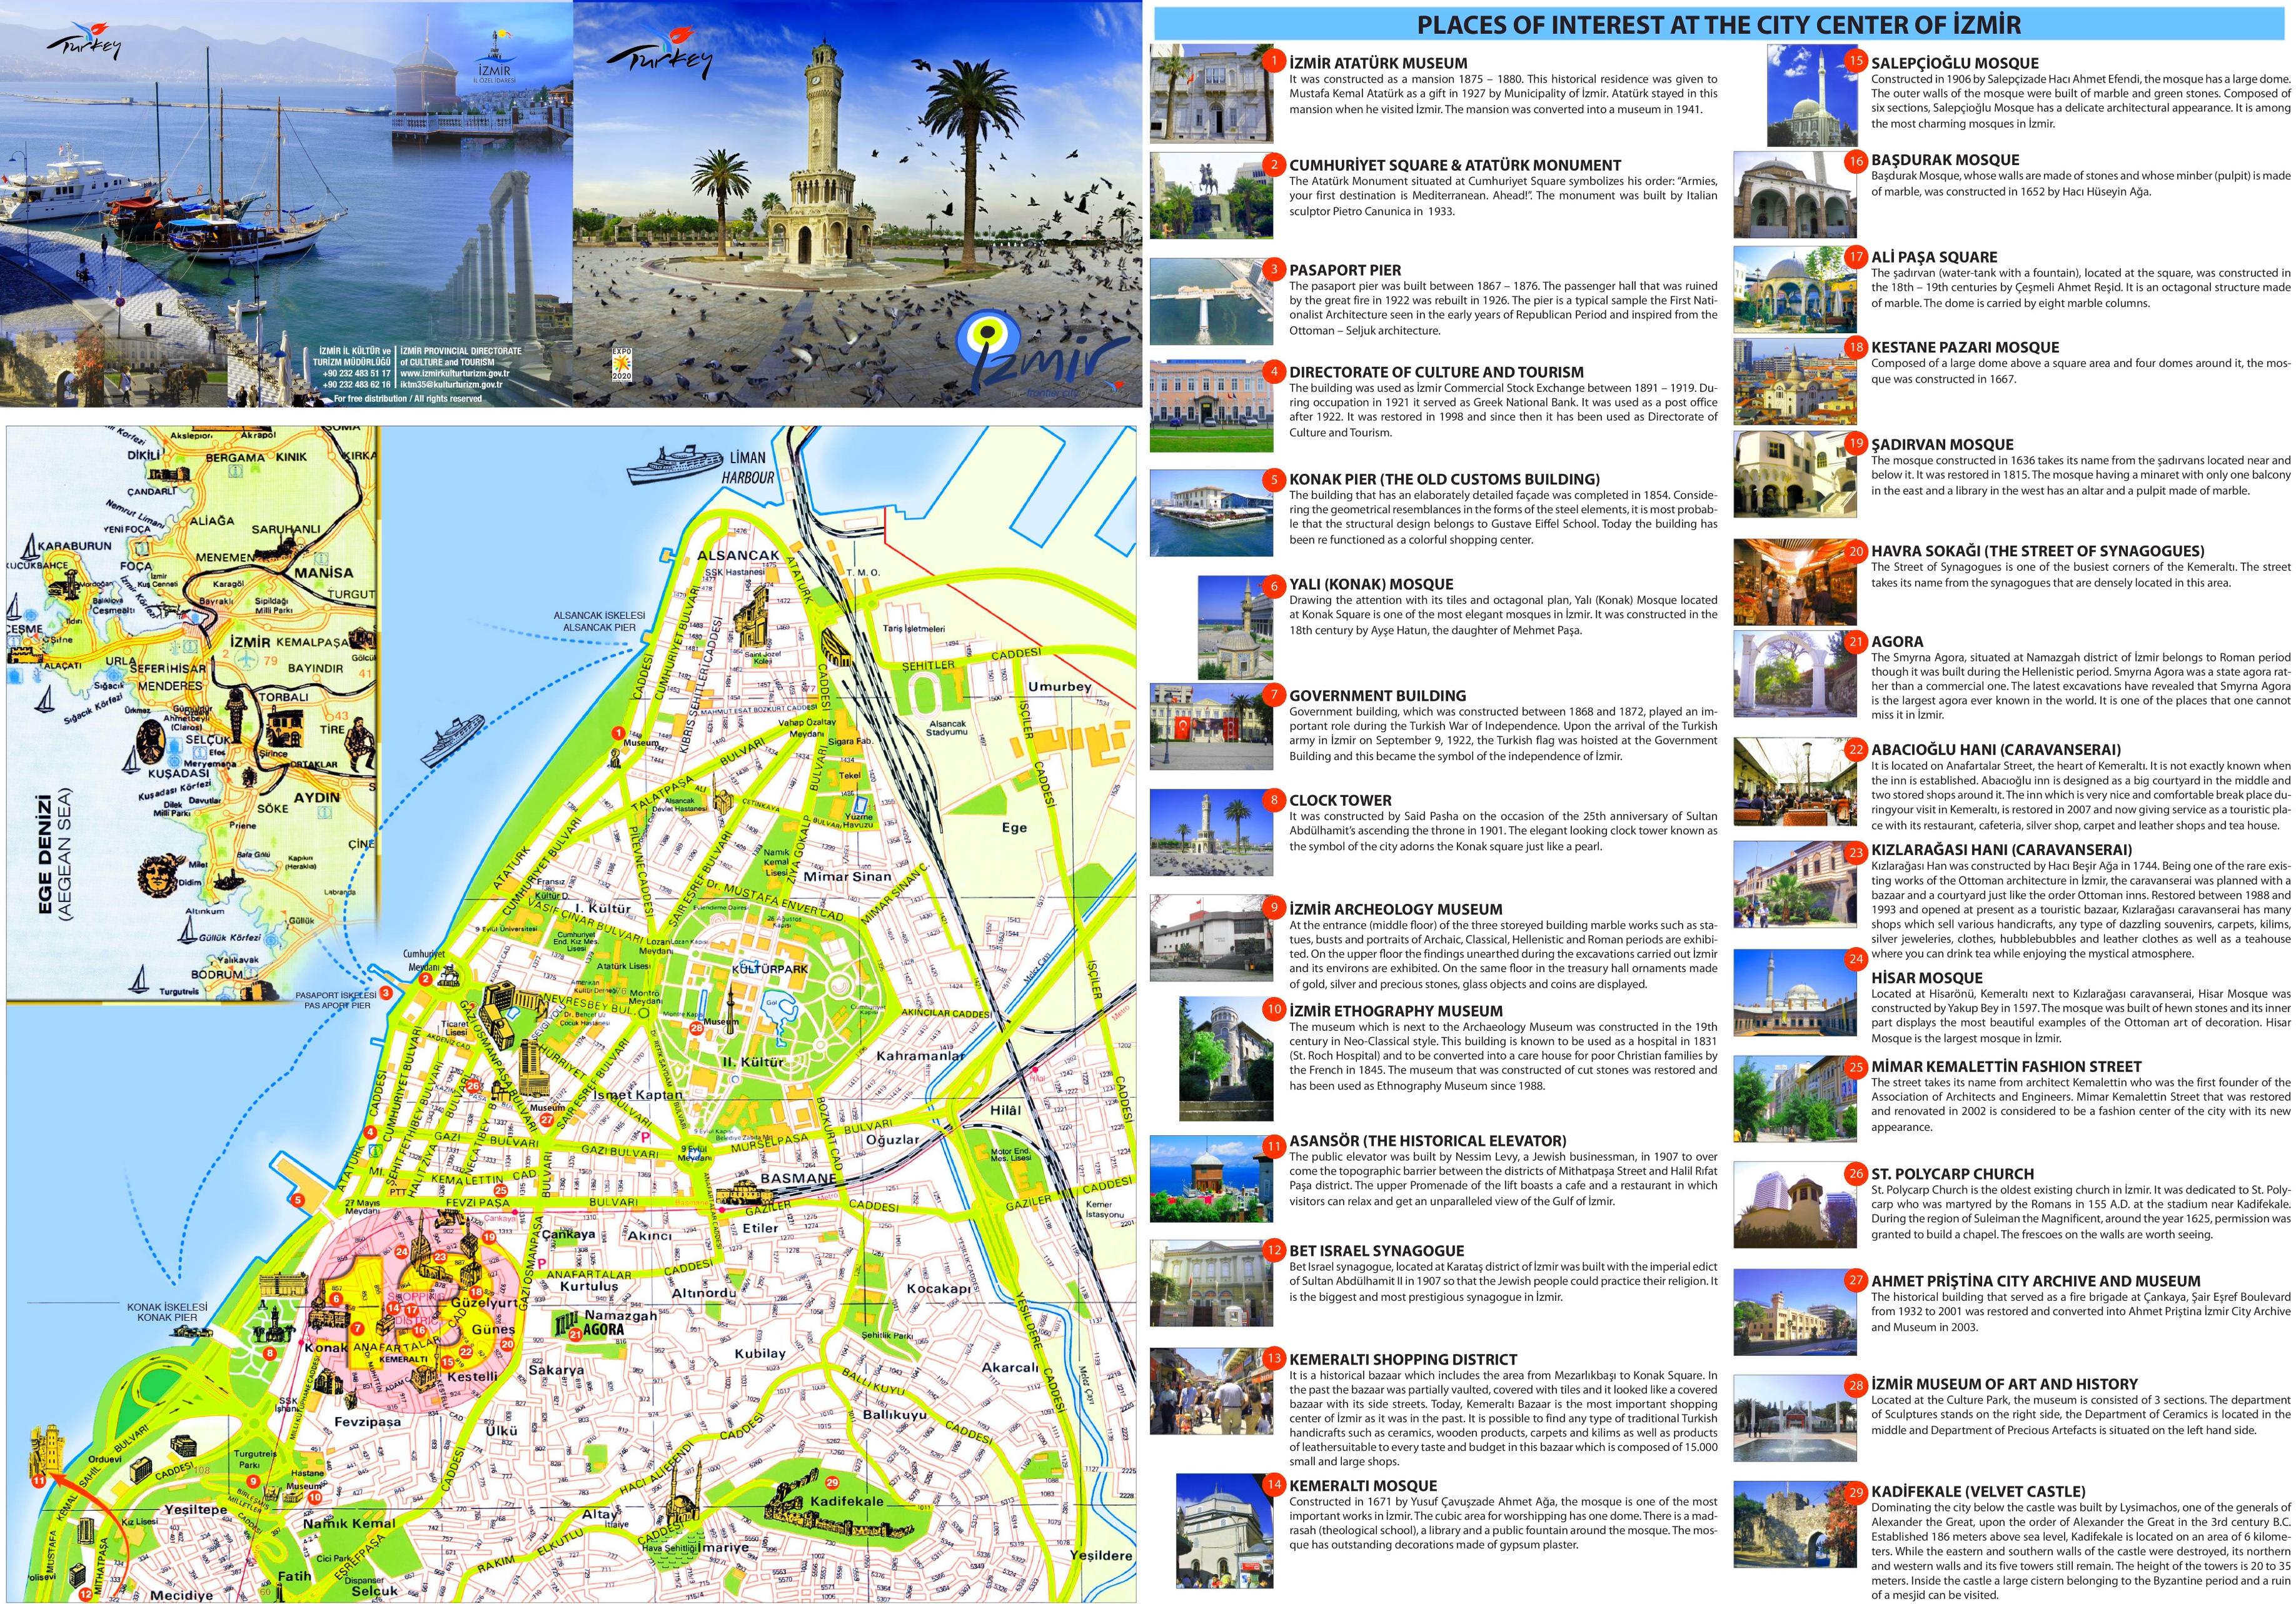 zmir tourist attractions map